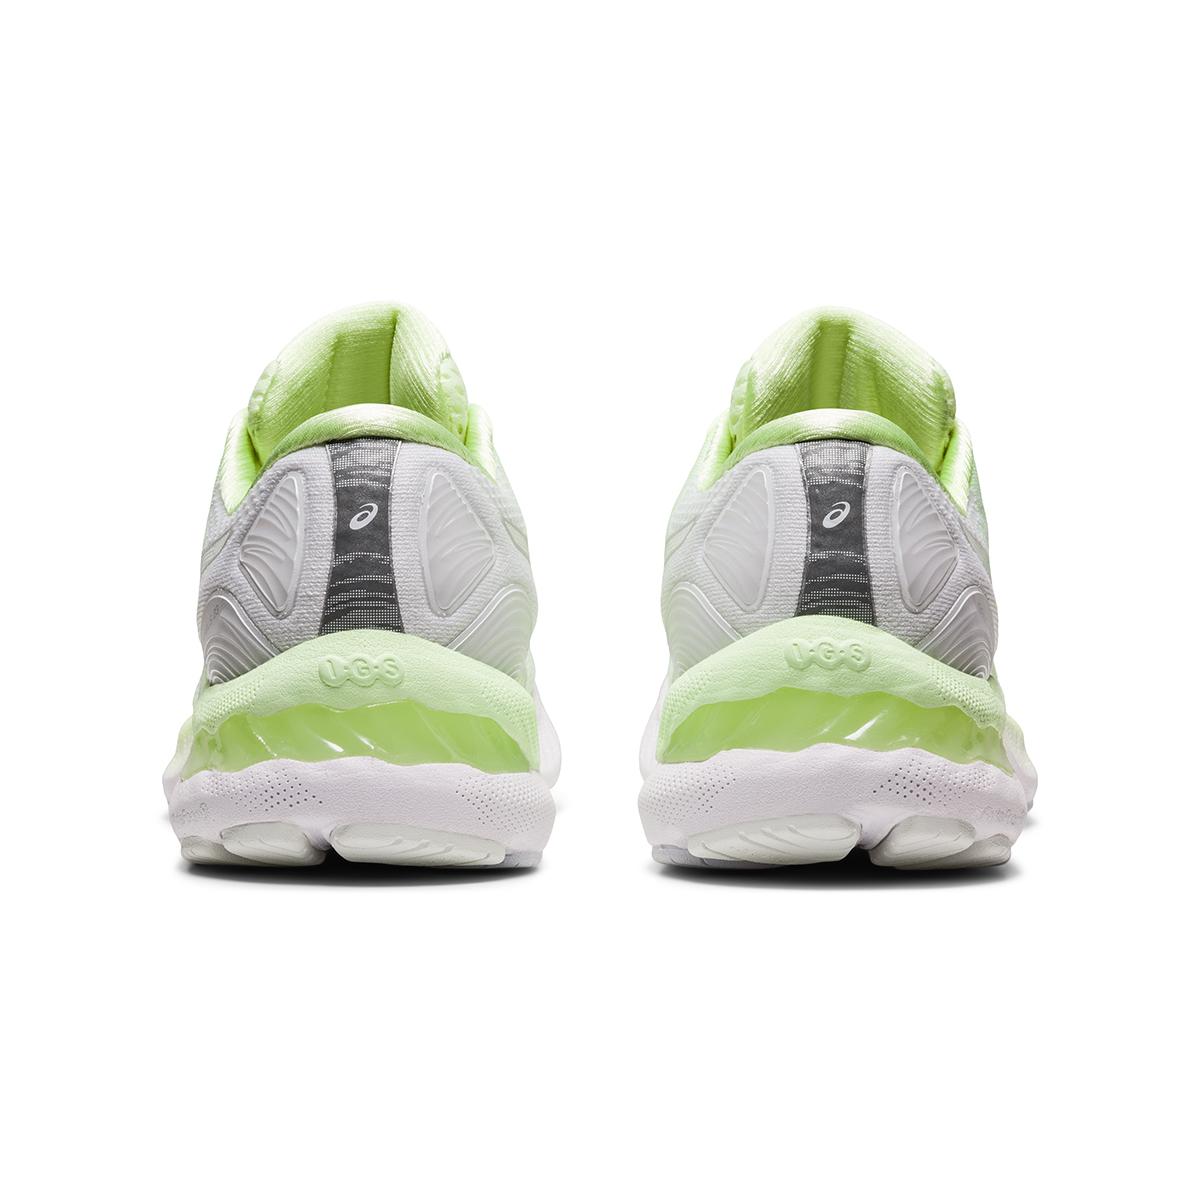 Women's Asics Gel-Nimbus 23 Running Shoe - Color: Illuminate Yellow - Size: 5 - Width: Regular, Illuminate Yellow, large, image 5